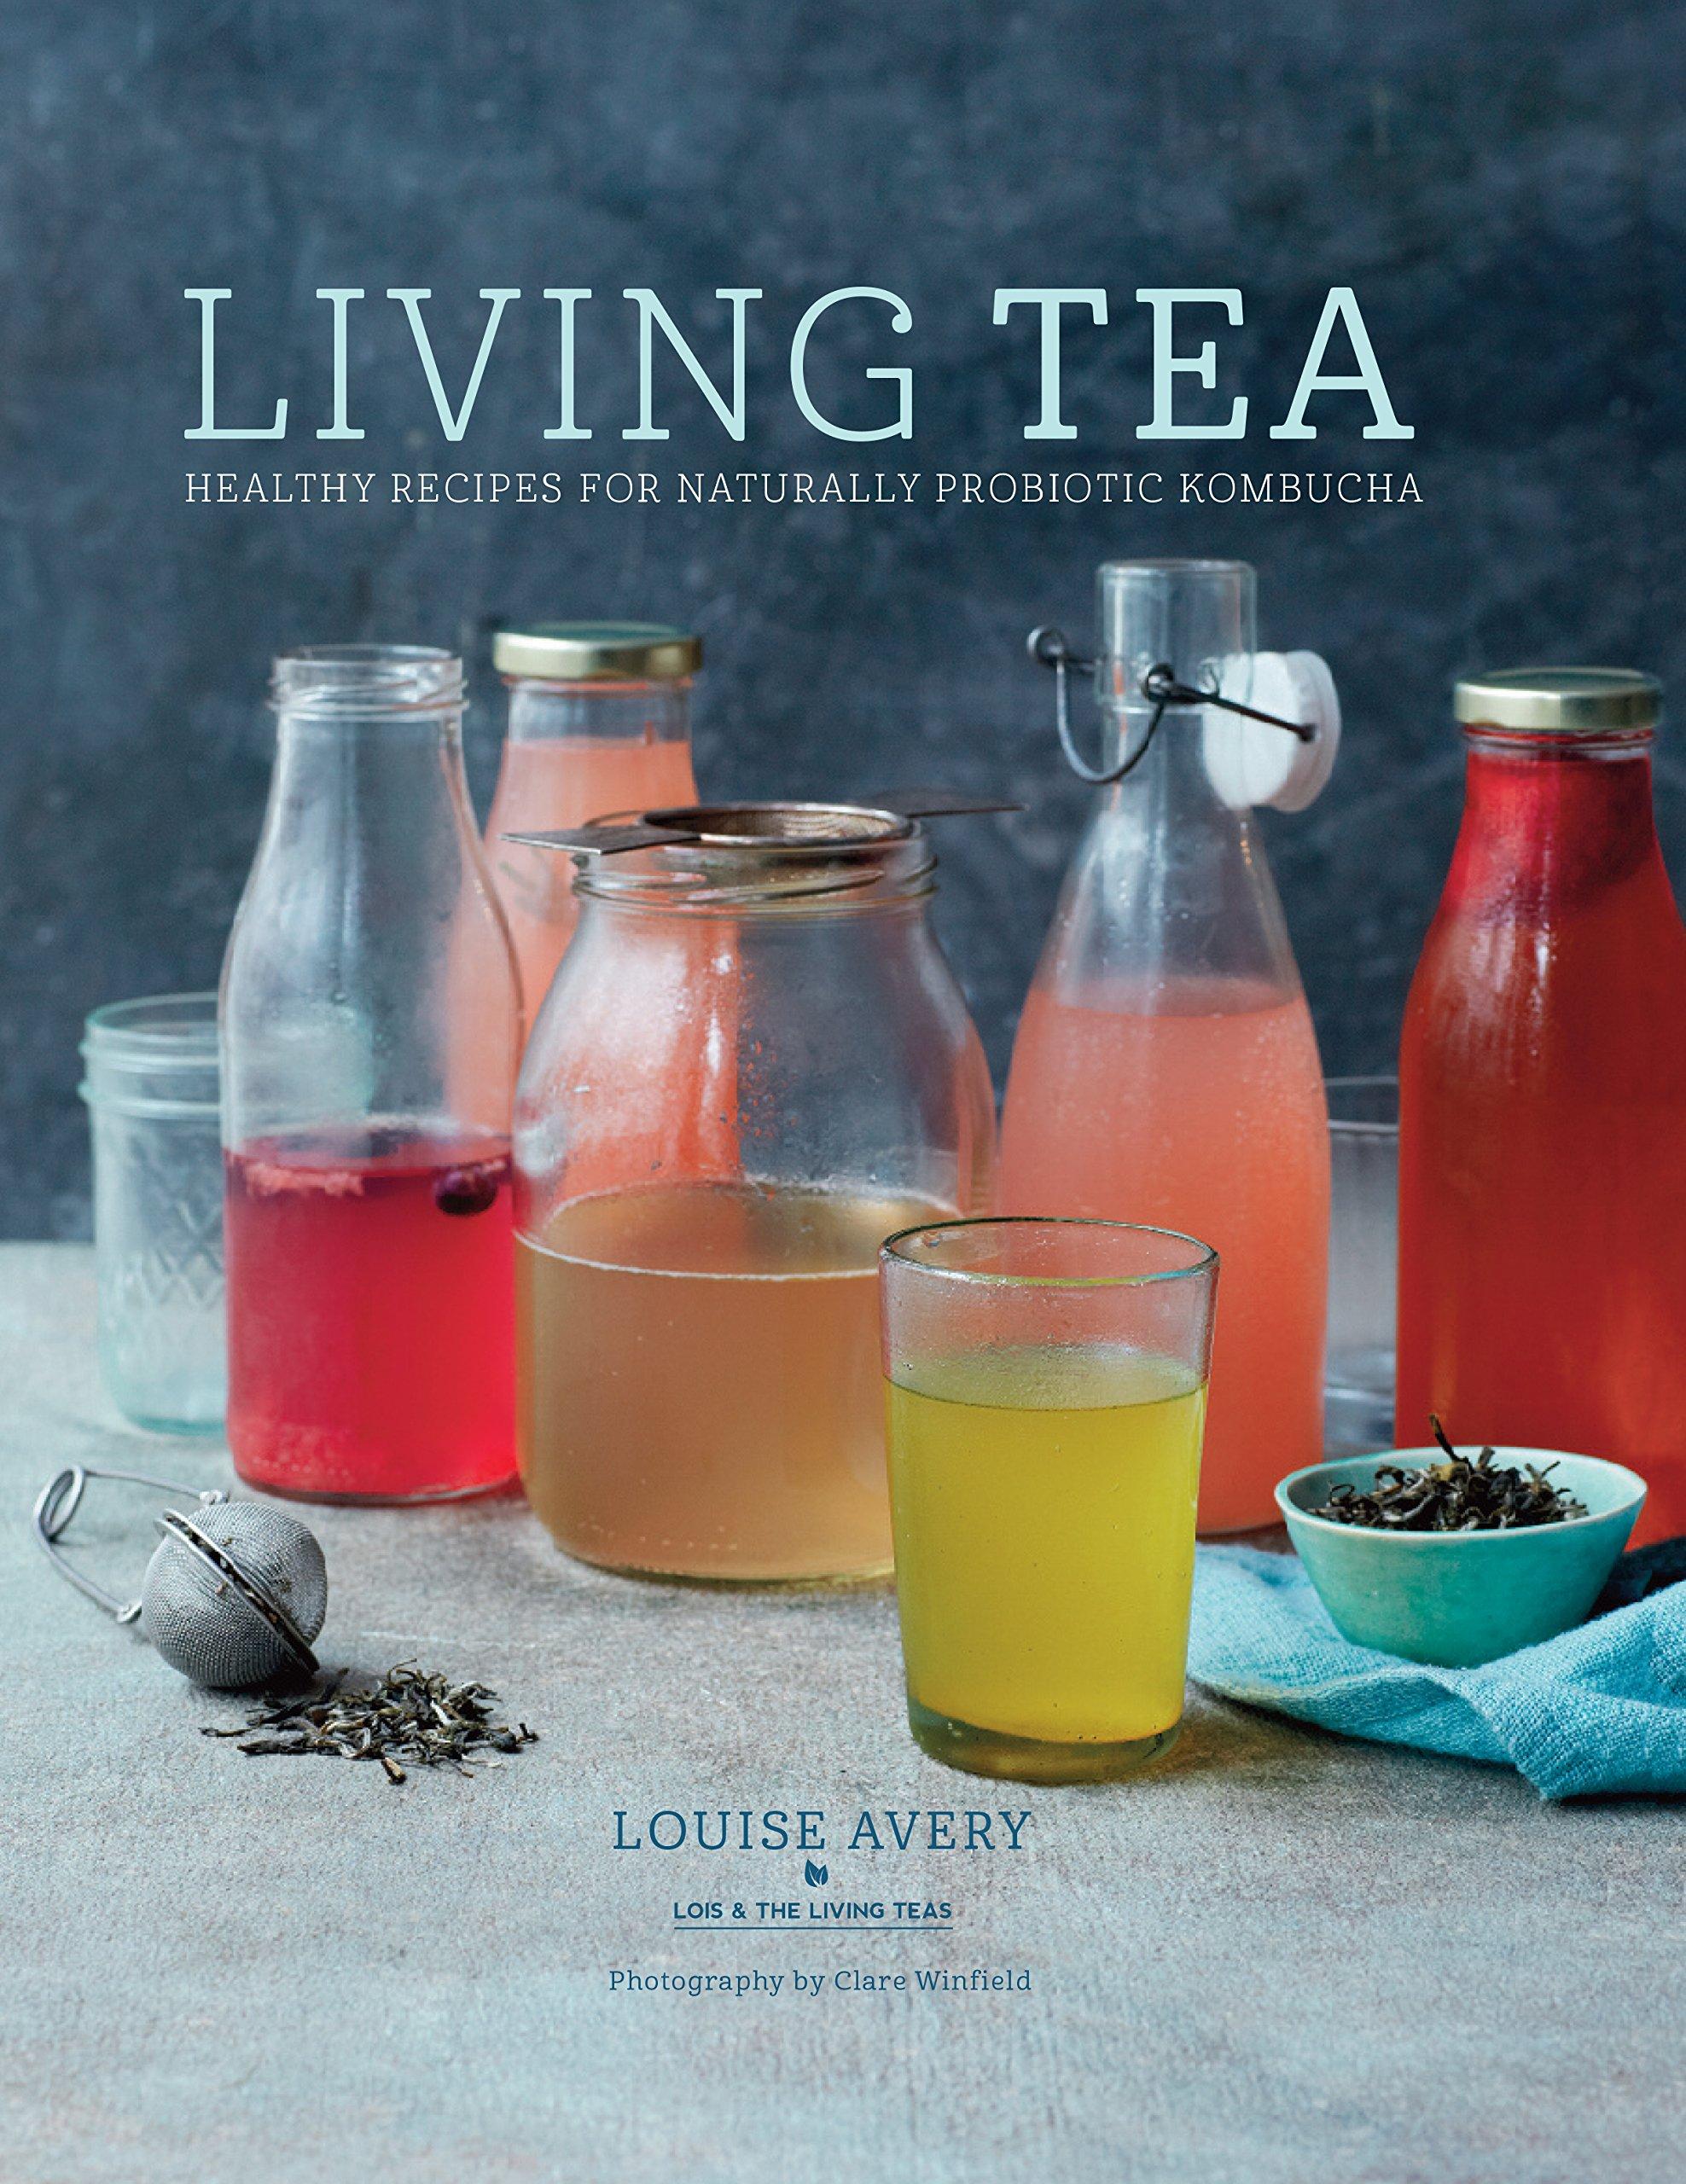 Living Tea: Healthy recipes for naturally probiotic kombucha: Amazon.co.uk:  Louise Avery: 9781849757690: Books